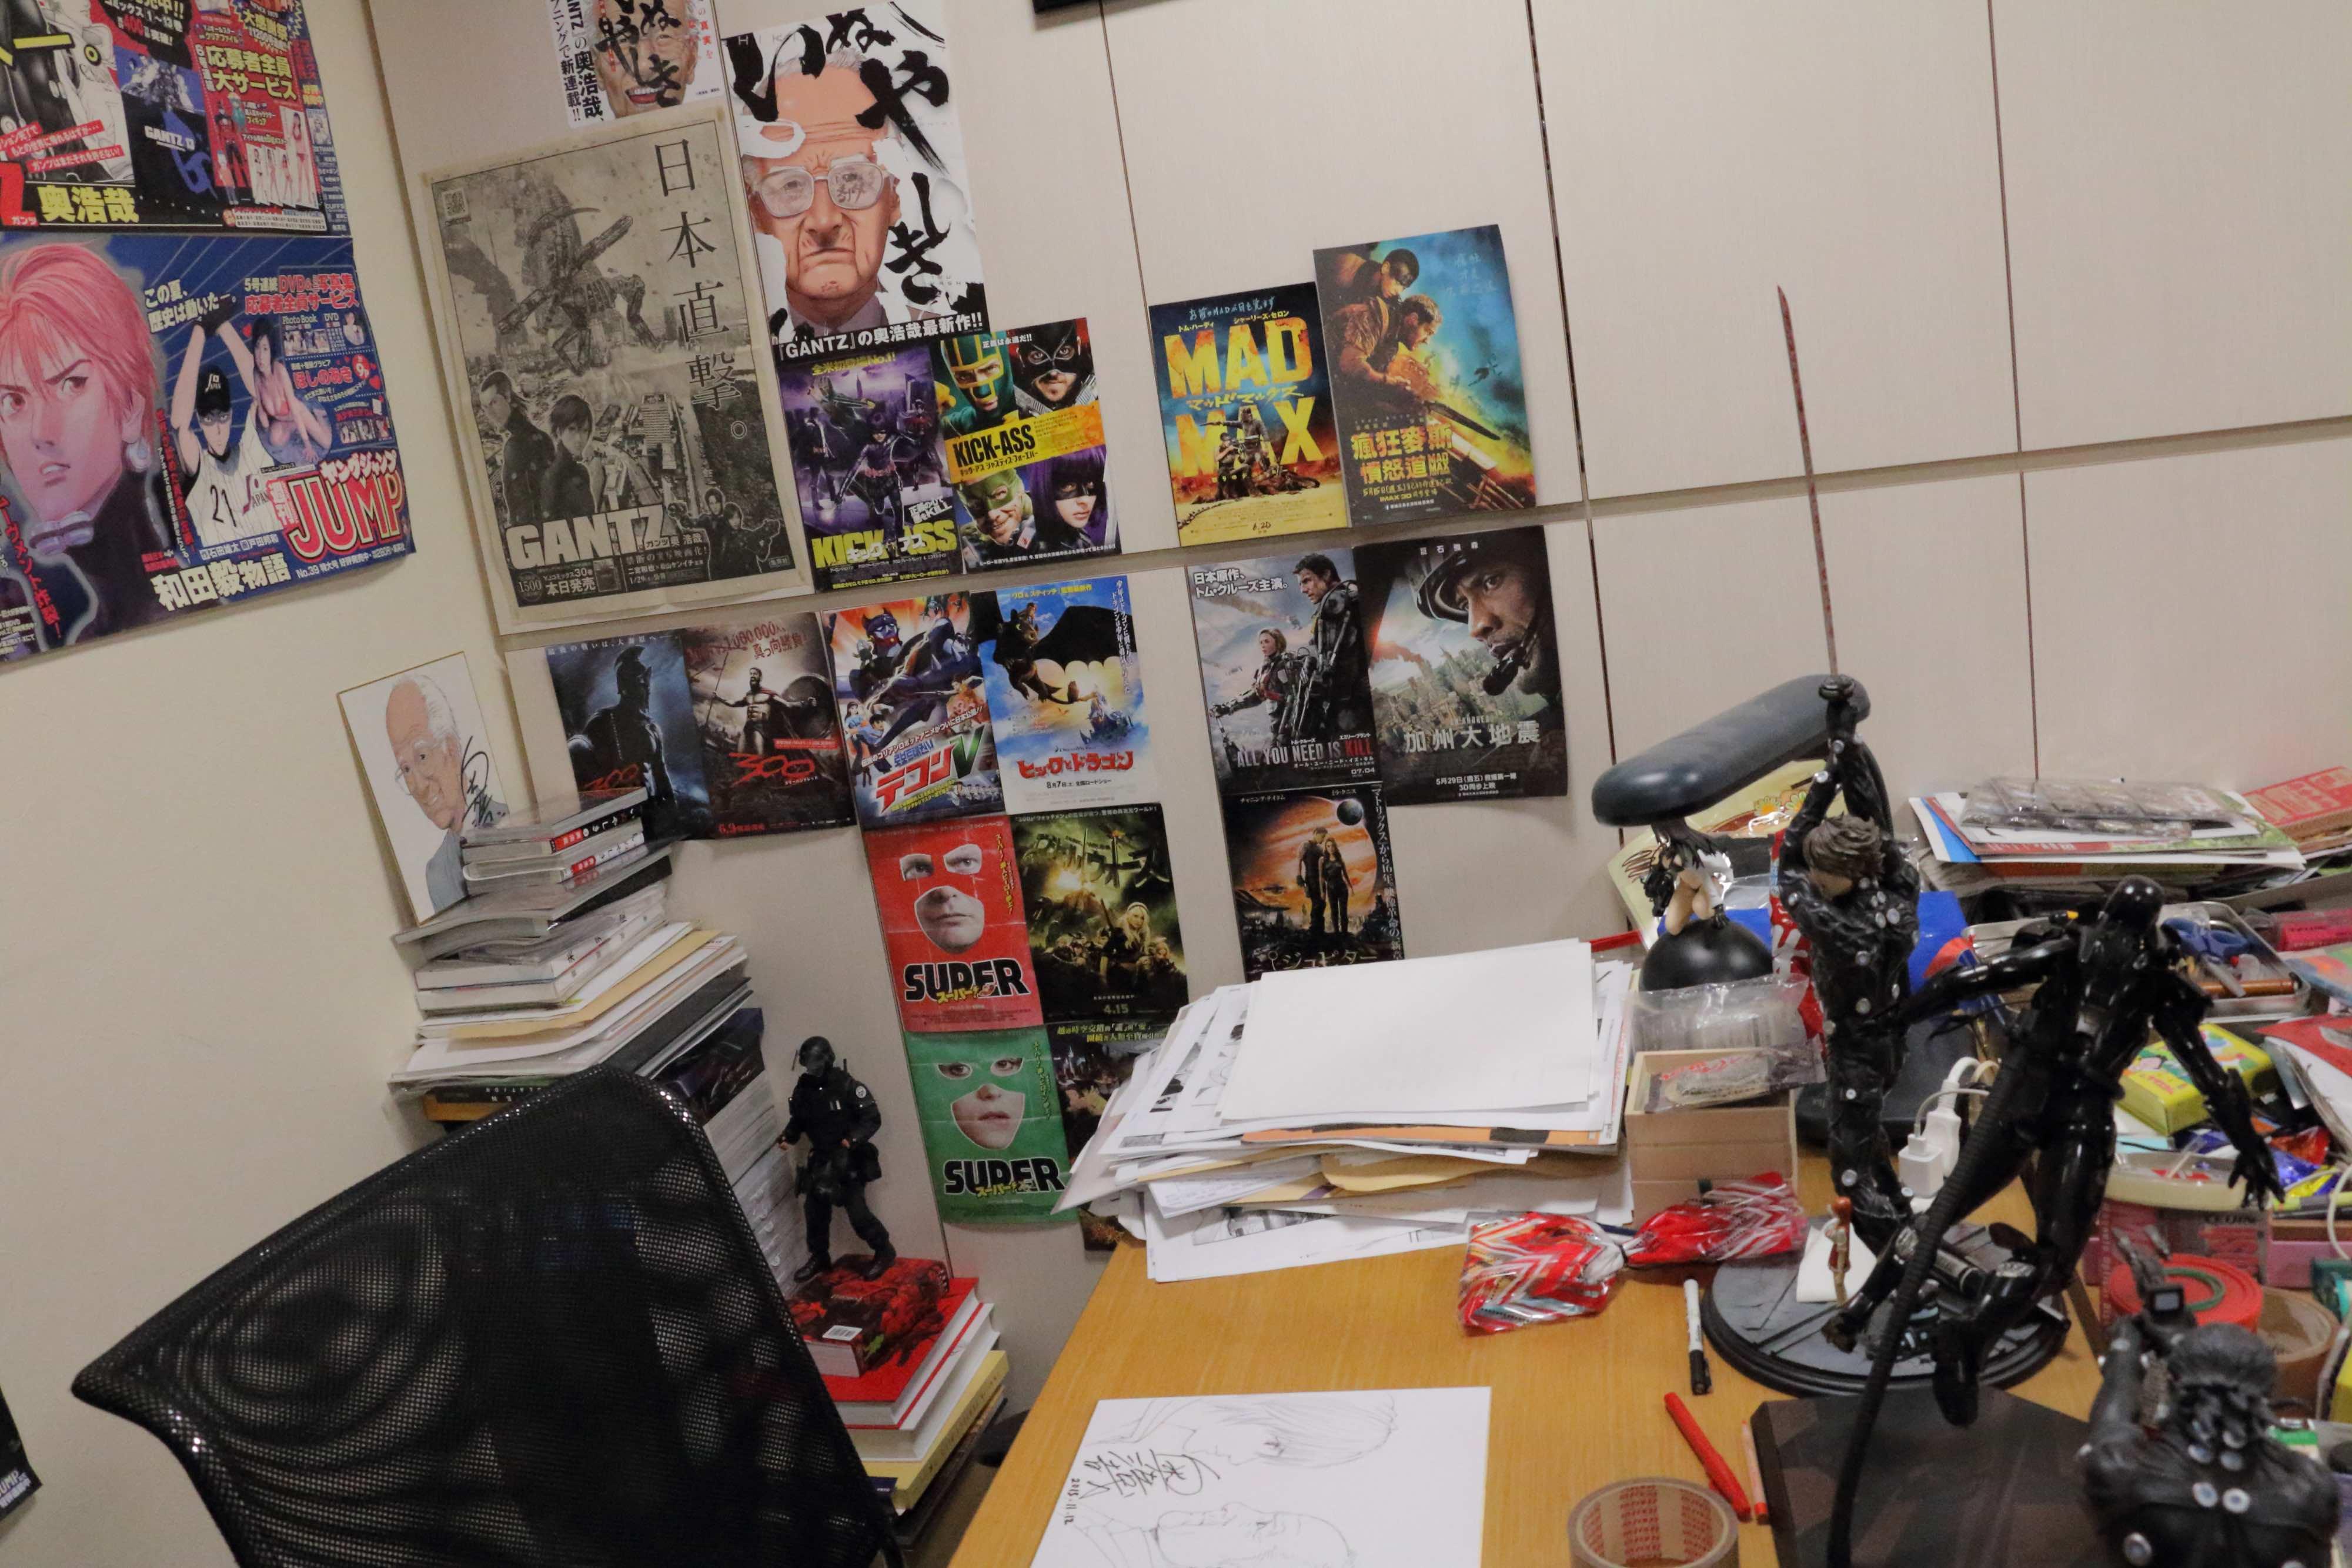 oku-desk Hiroya Oku on Inuyashiki